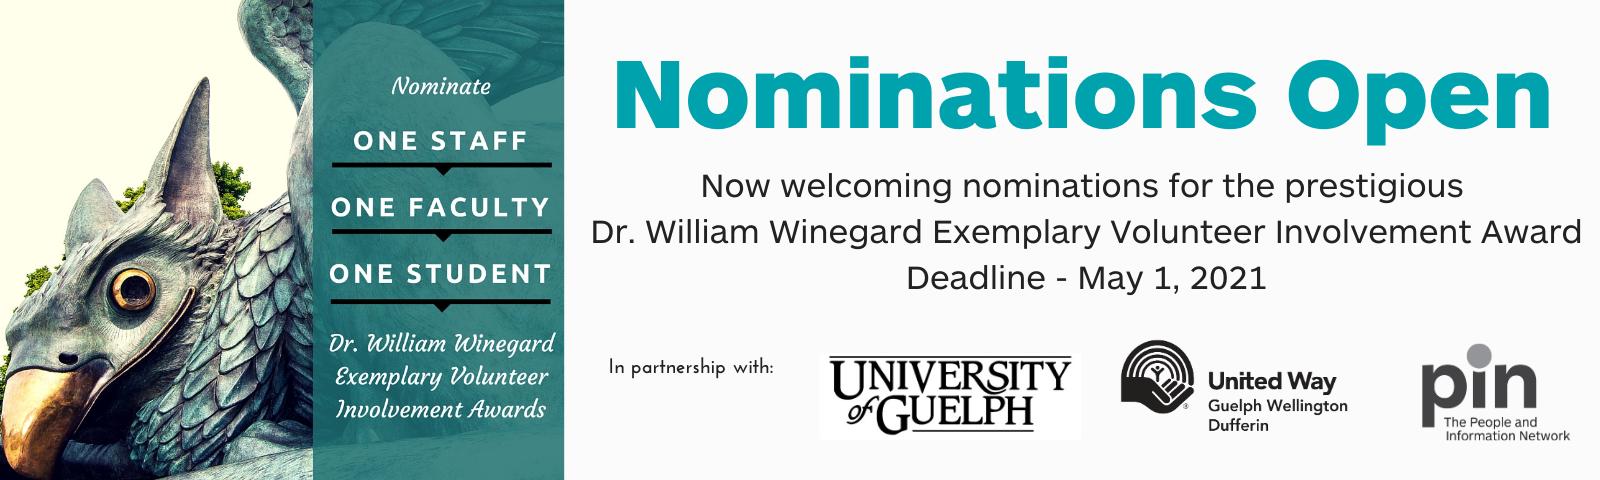 Dr. Winegard Exemplary Volunteer Awards